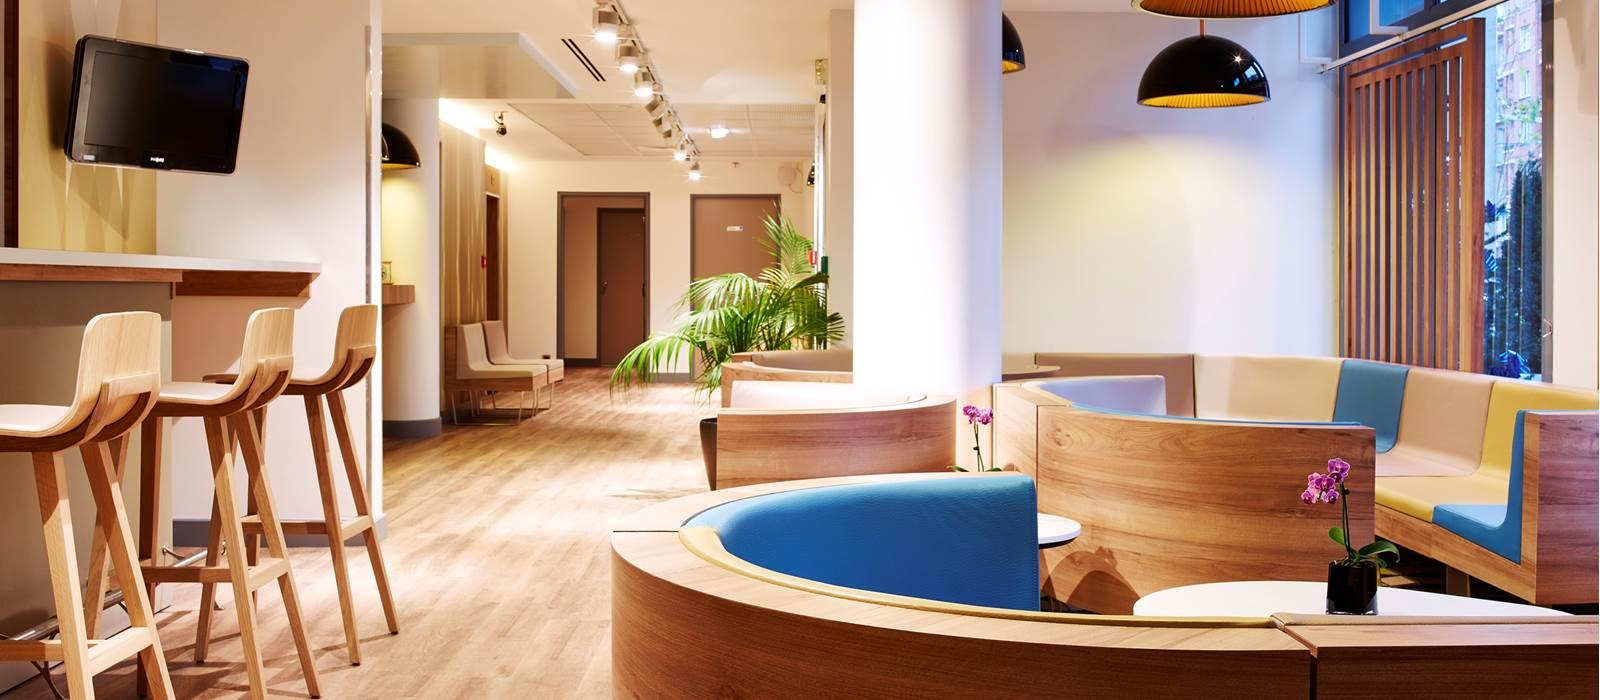 Offers packages in paris and geneva median hotels - Median hotel paris porte de versailles ...